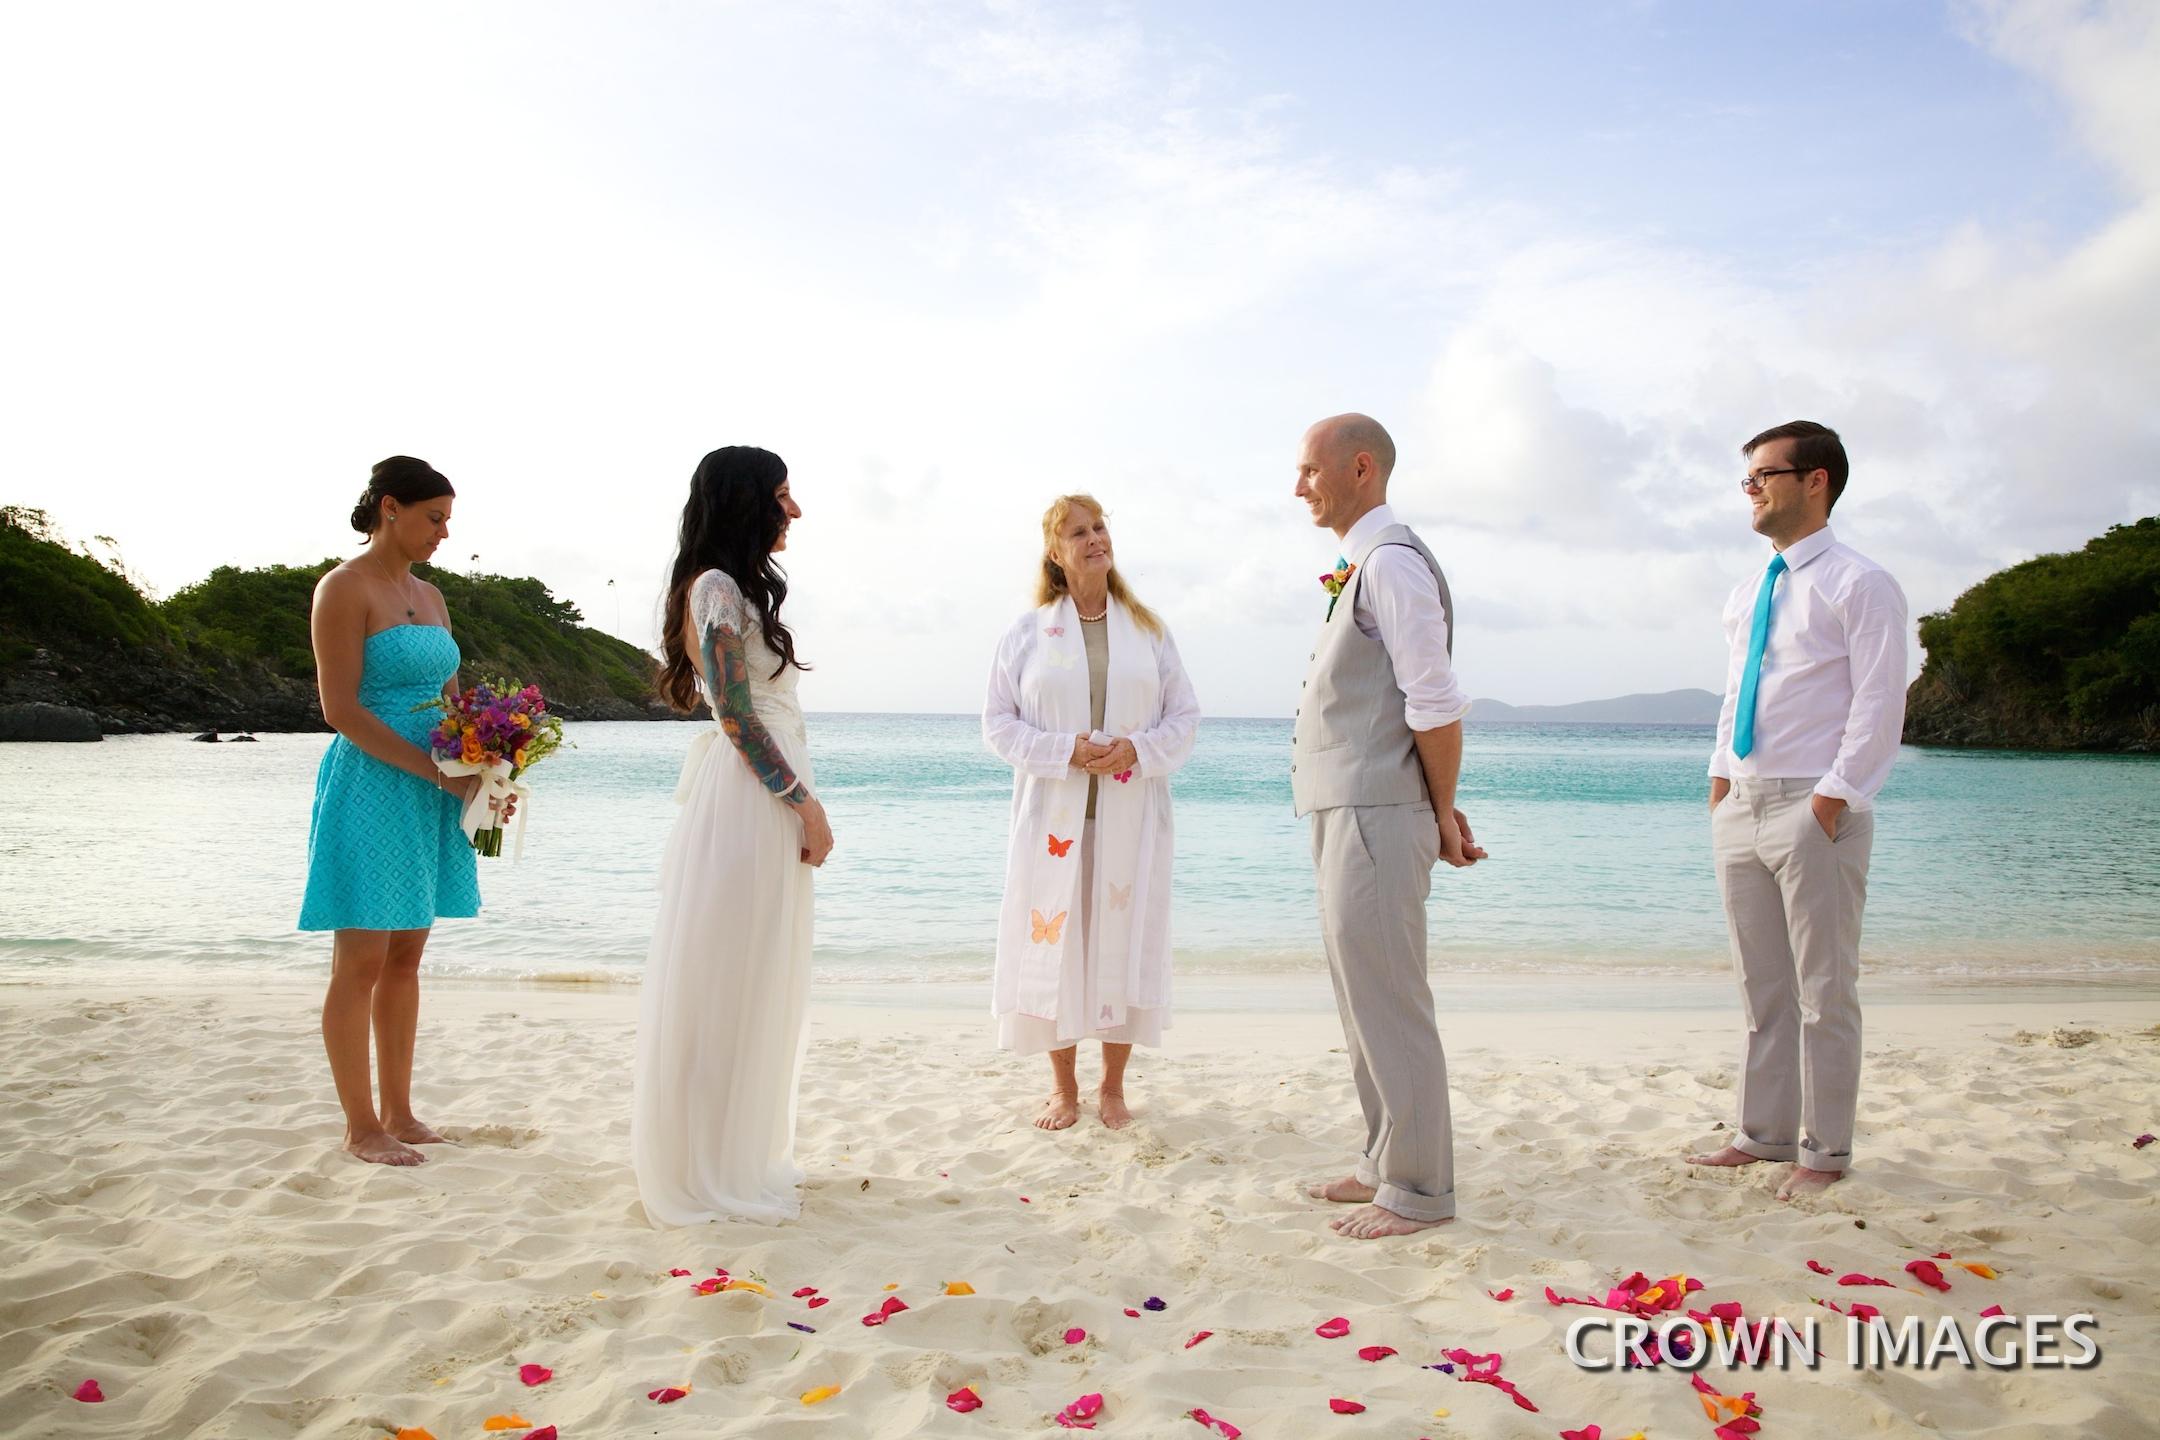 st john wedding officiant for beach ceremony